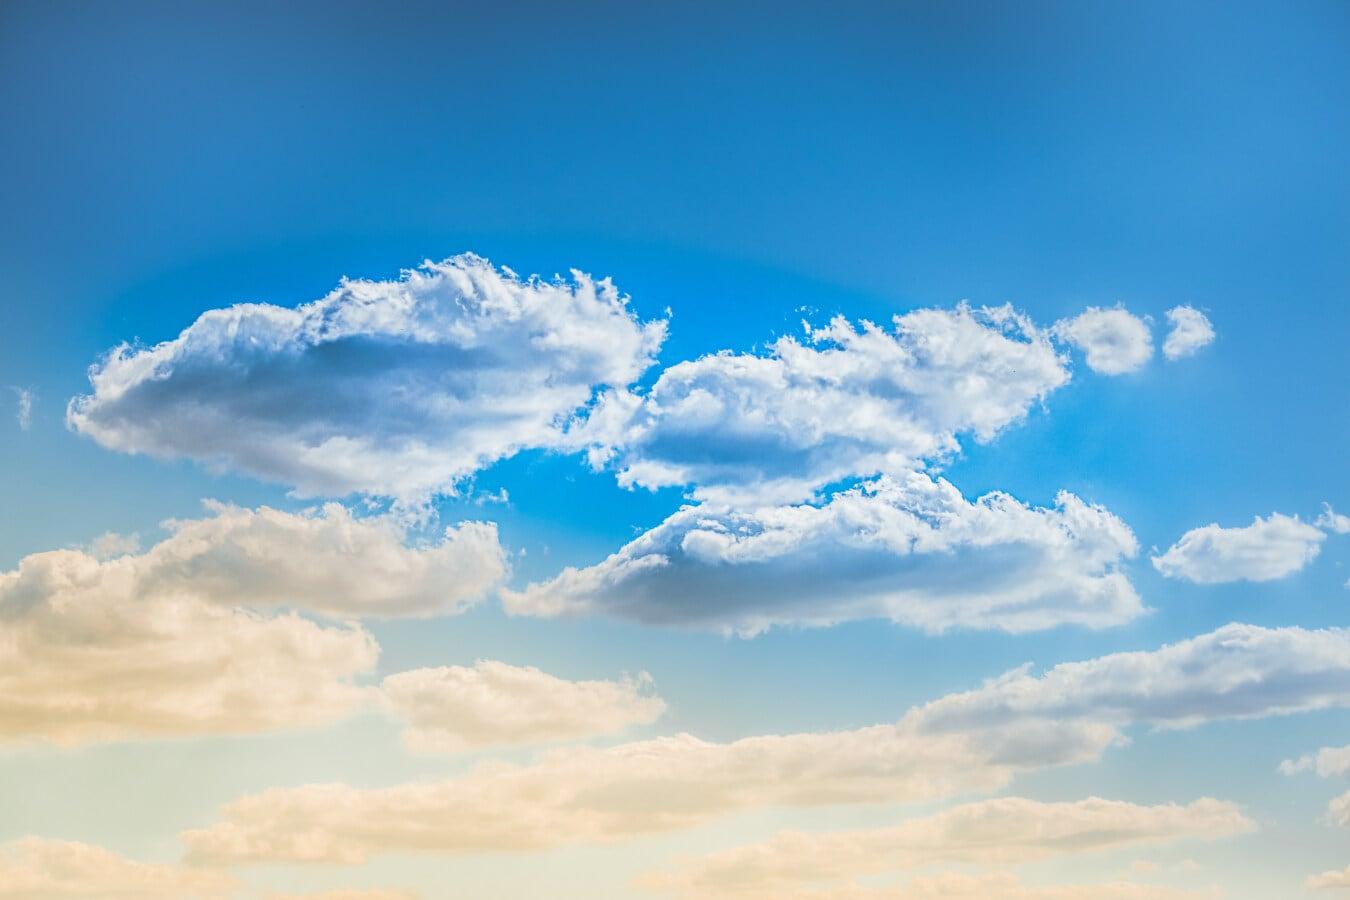 meteorology, overcast, sunshine, blue sky, sunrays, clouds, atmosphere, landscape, majestic, nature